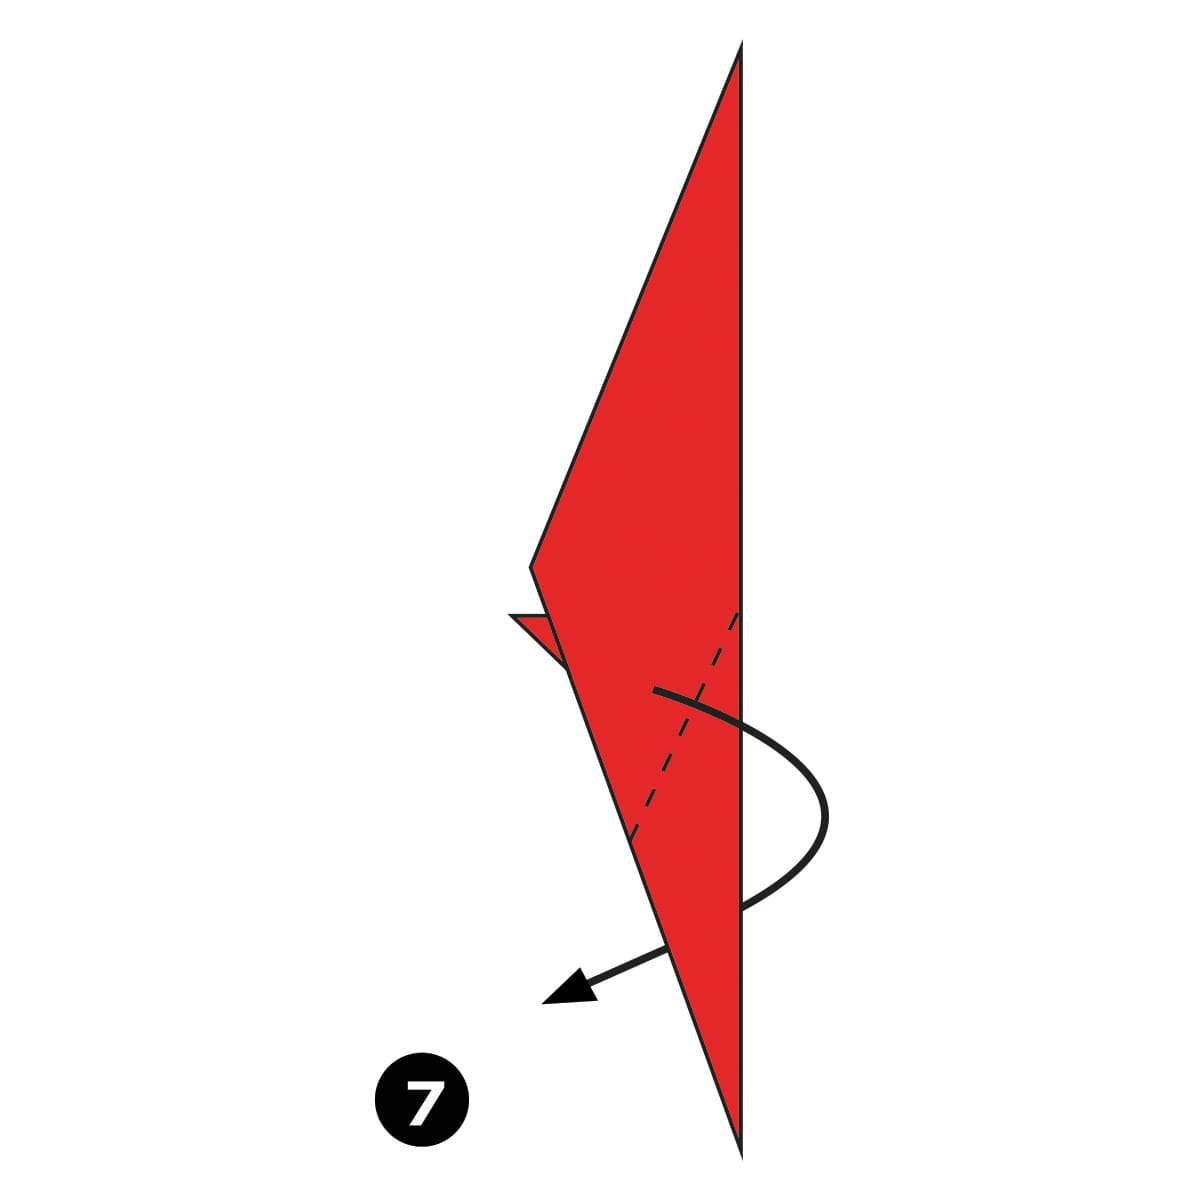 Parrot Step 7